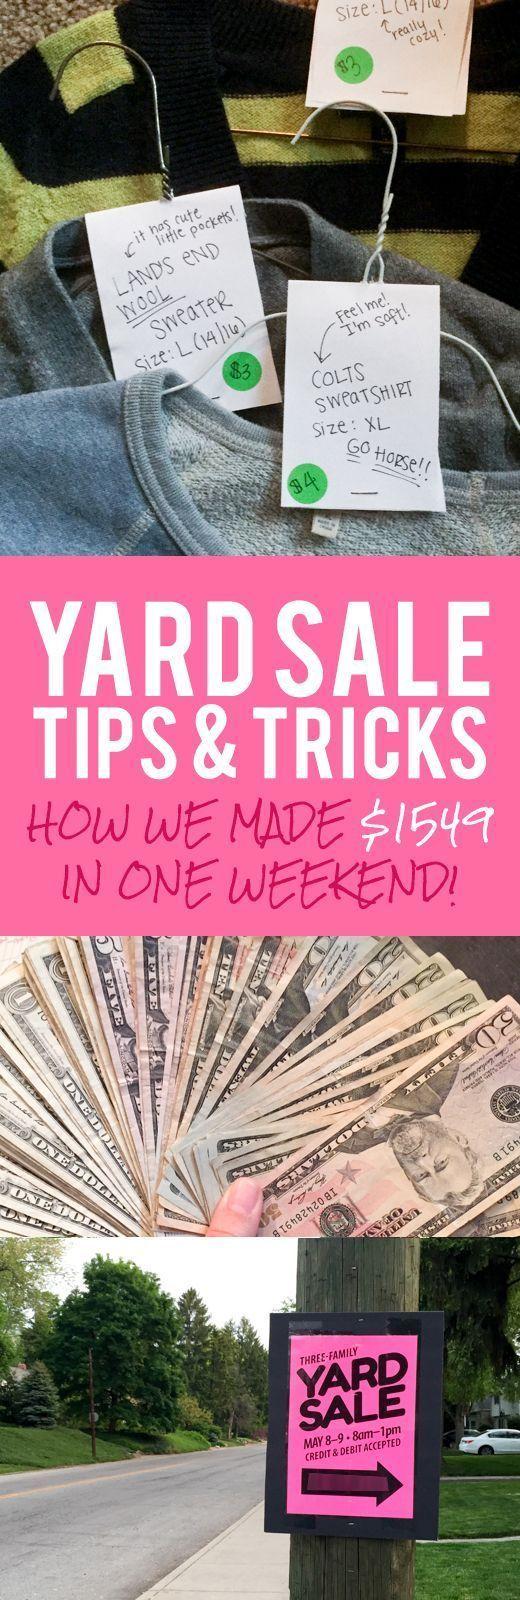 Yard Sale Tips & Tricks: How we made $1549 in one weekend!!